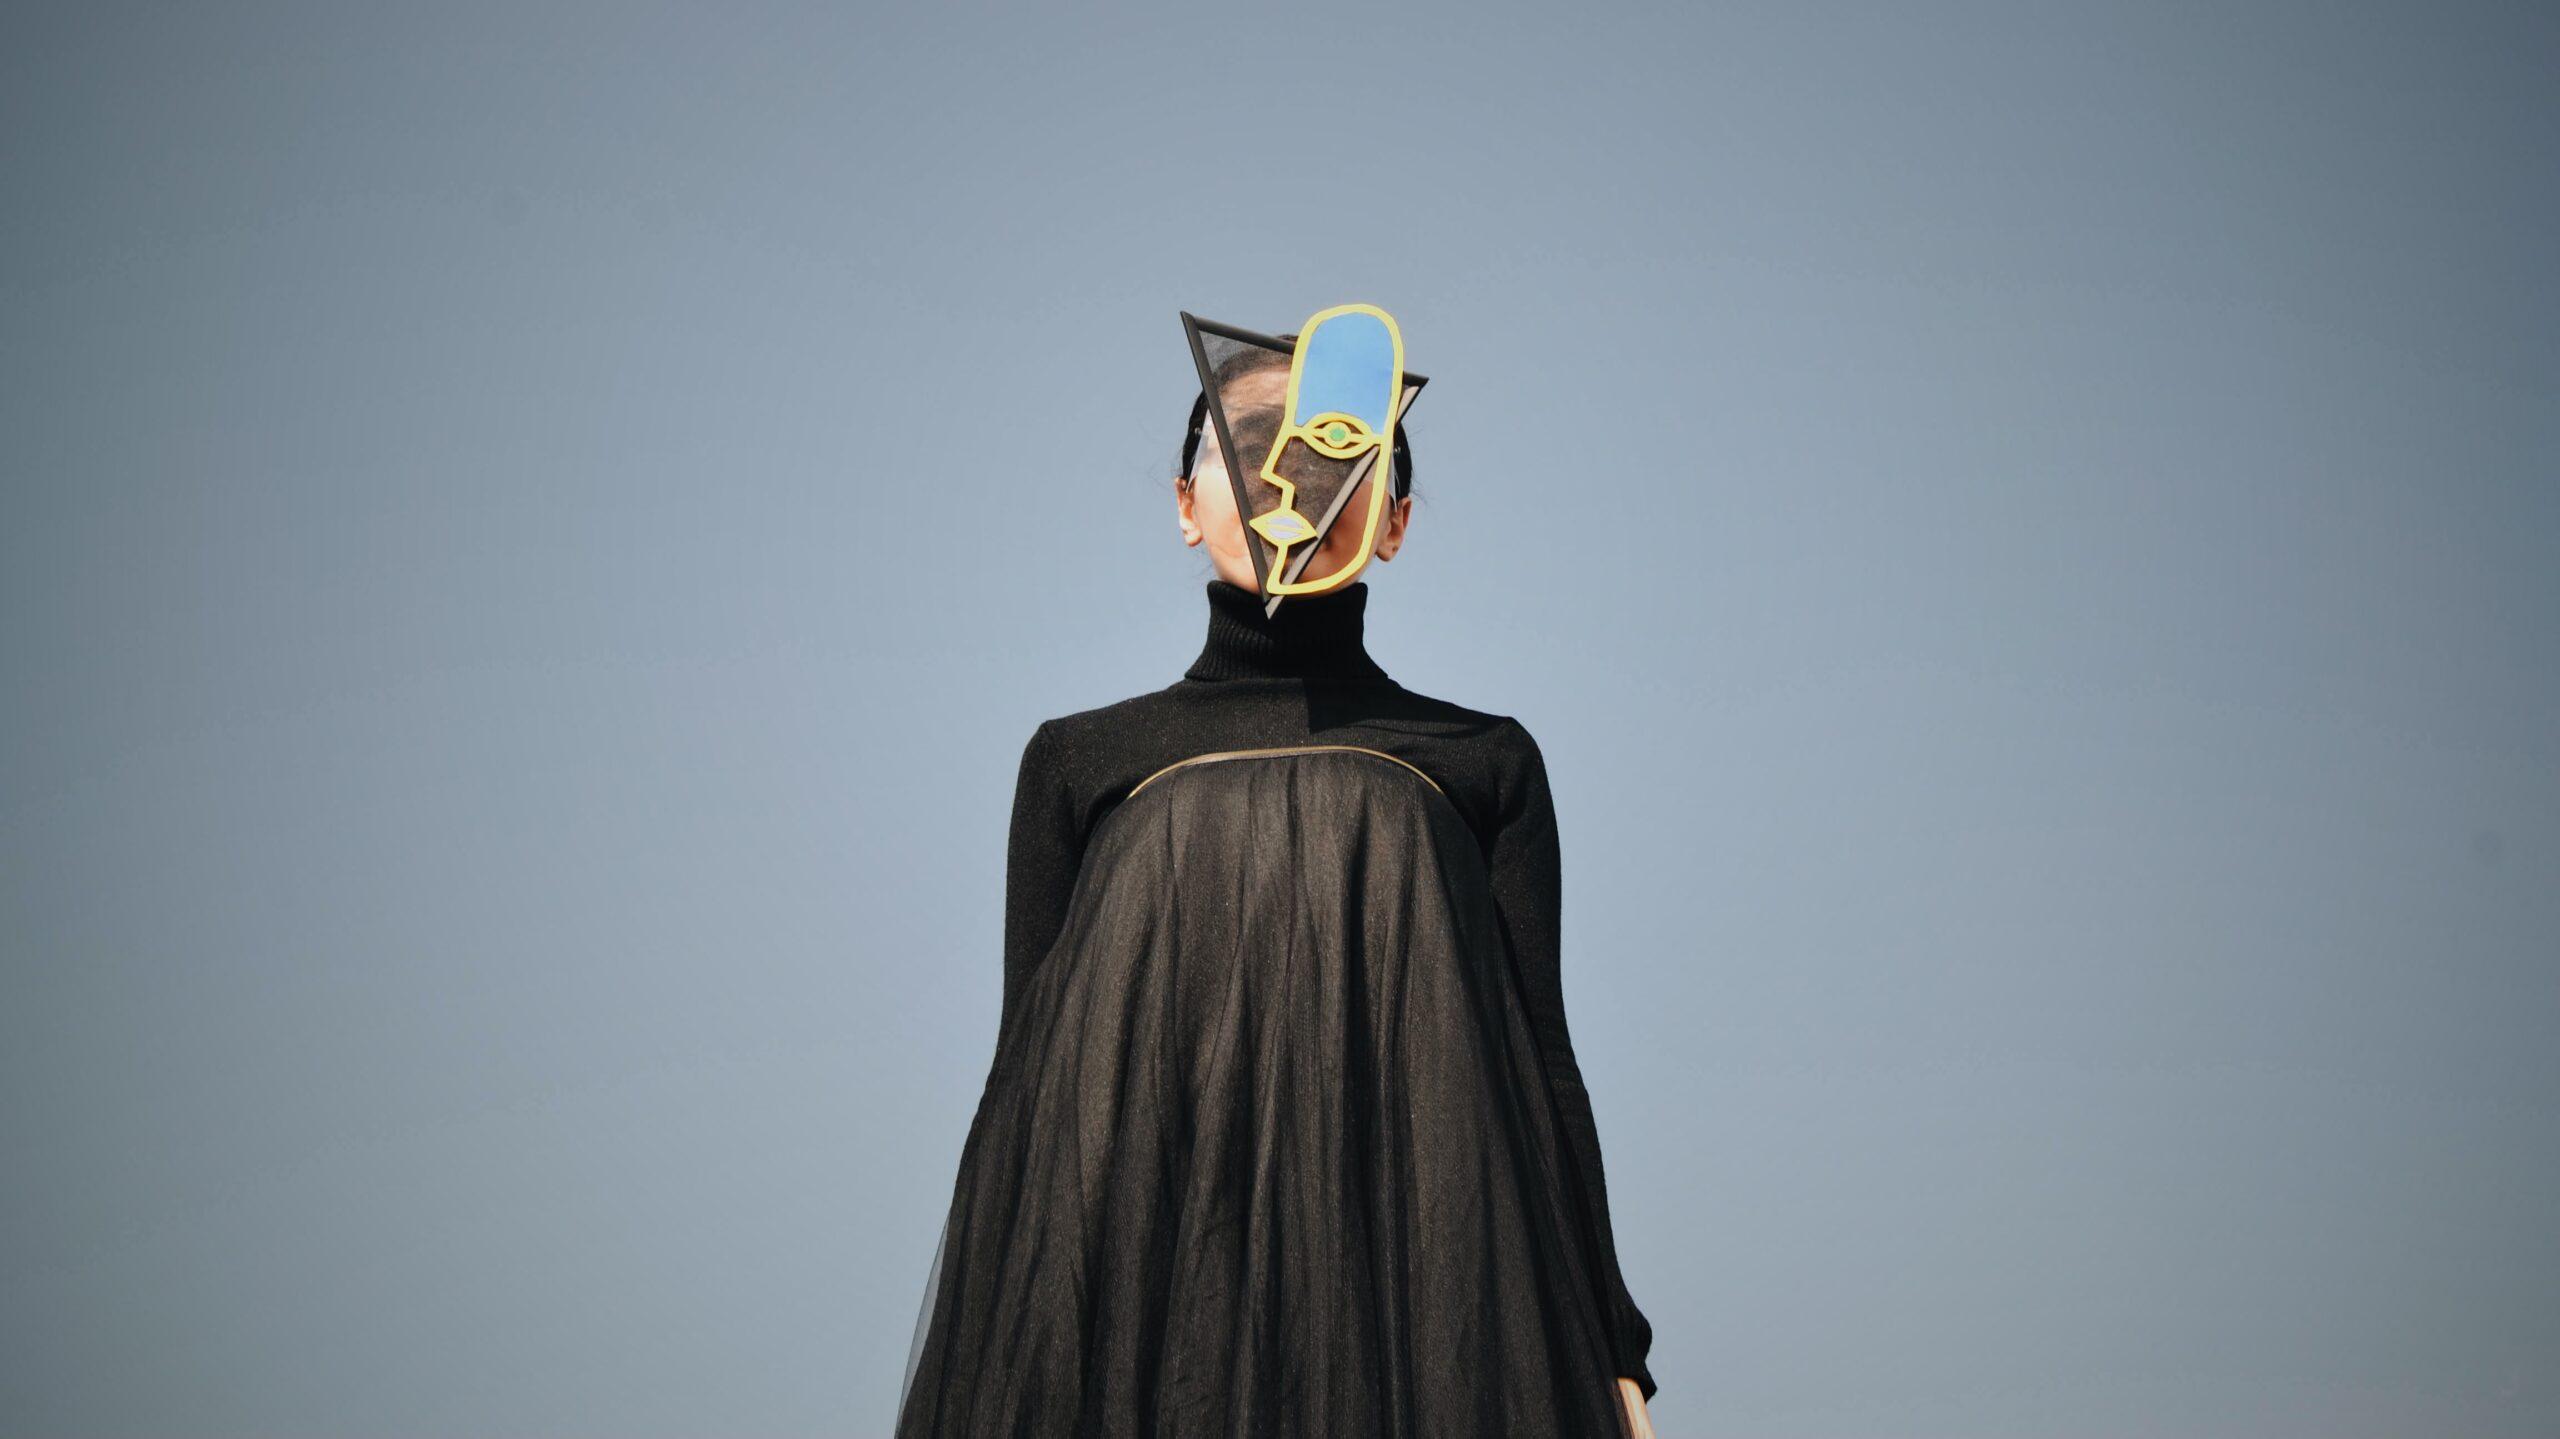 Pròteo - Alessandra Maur